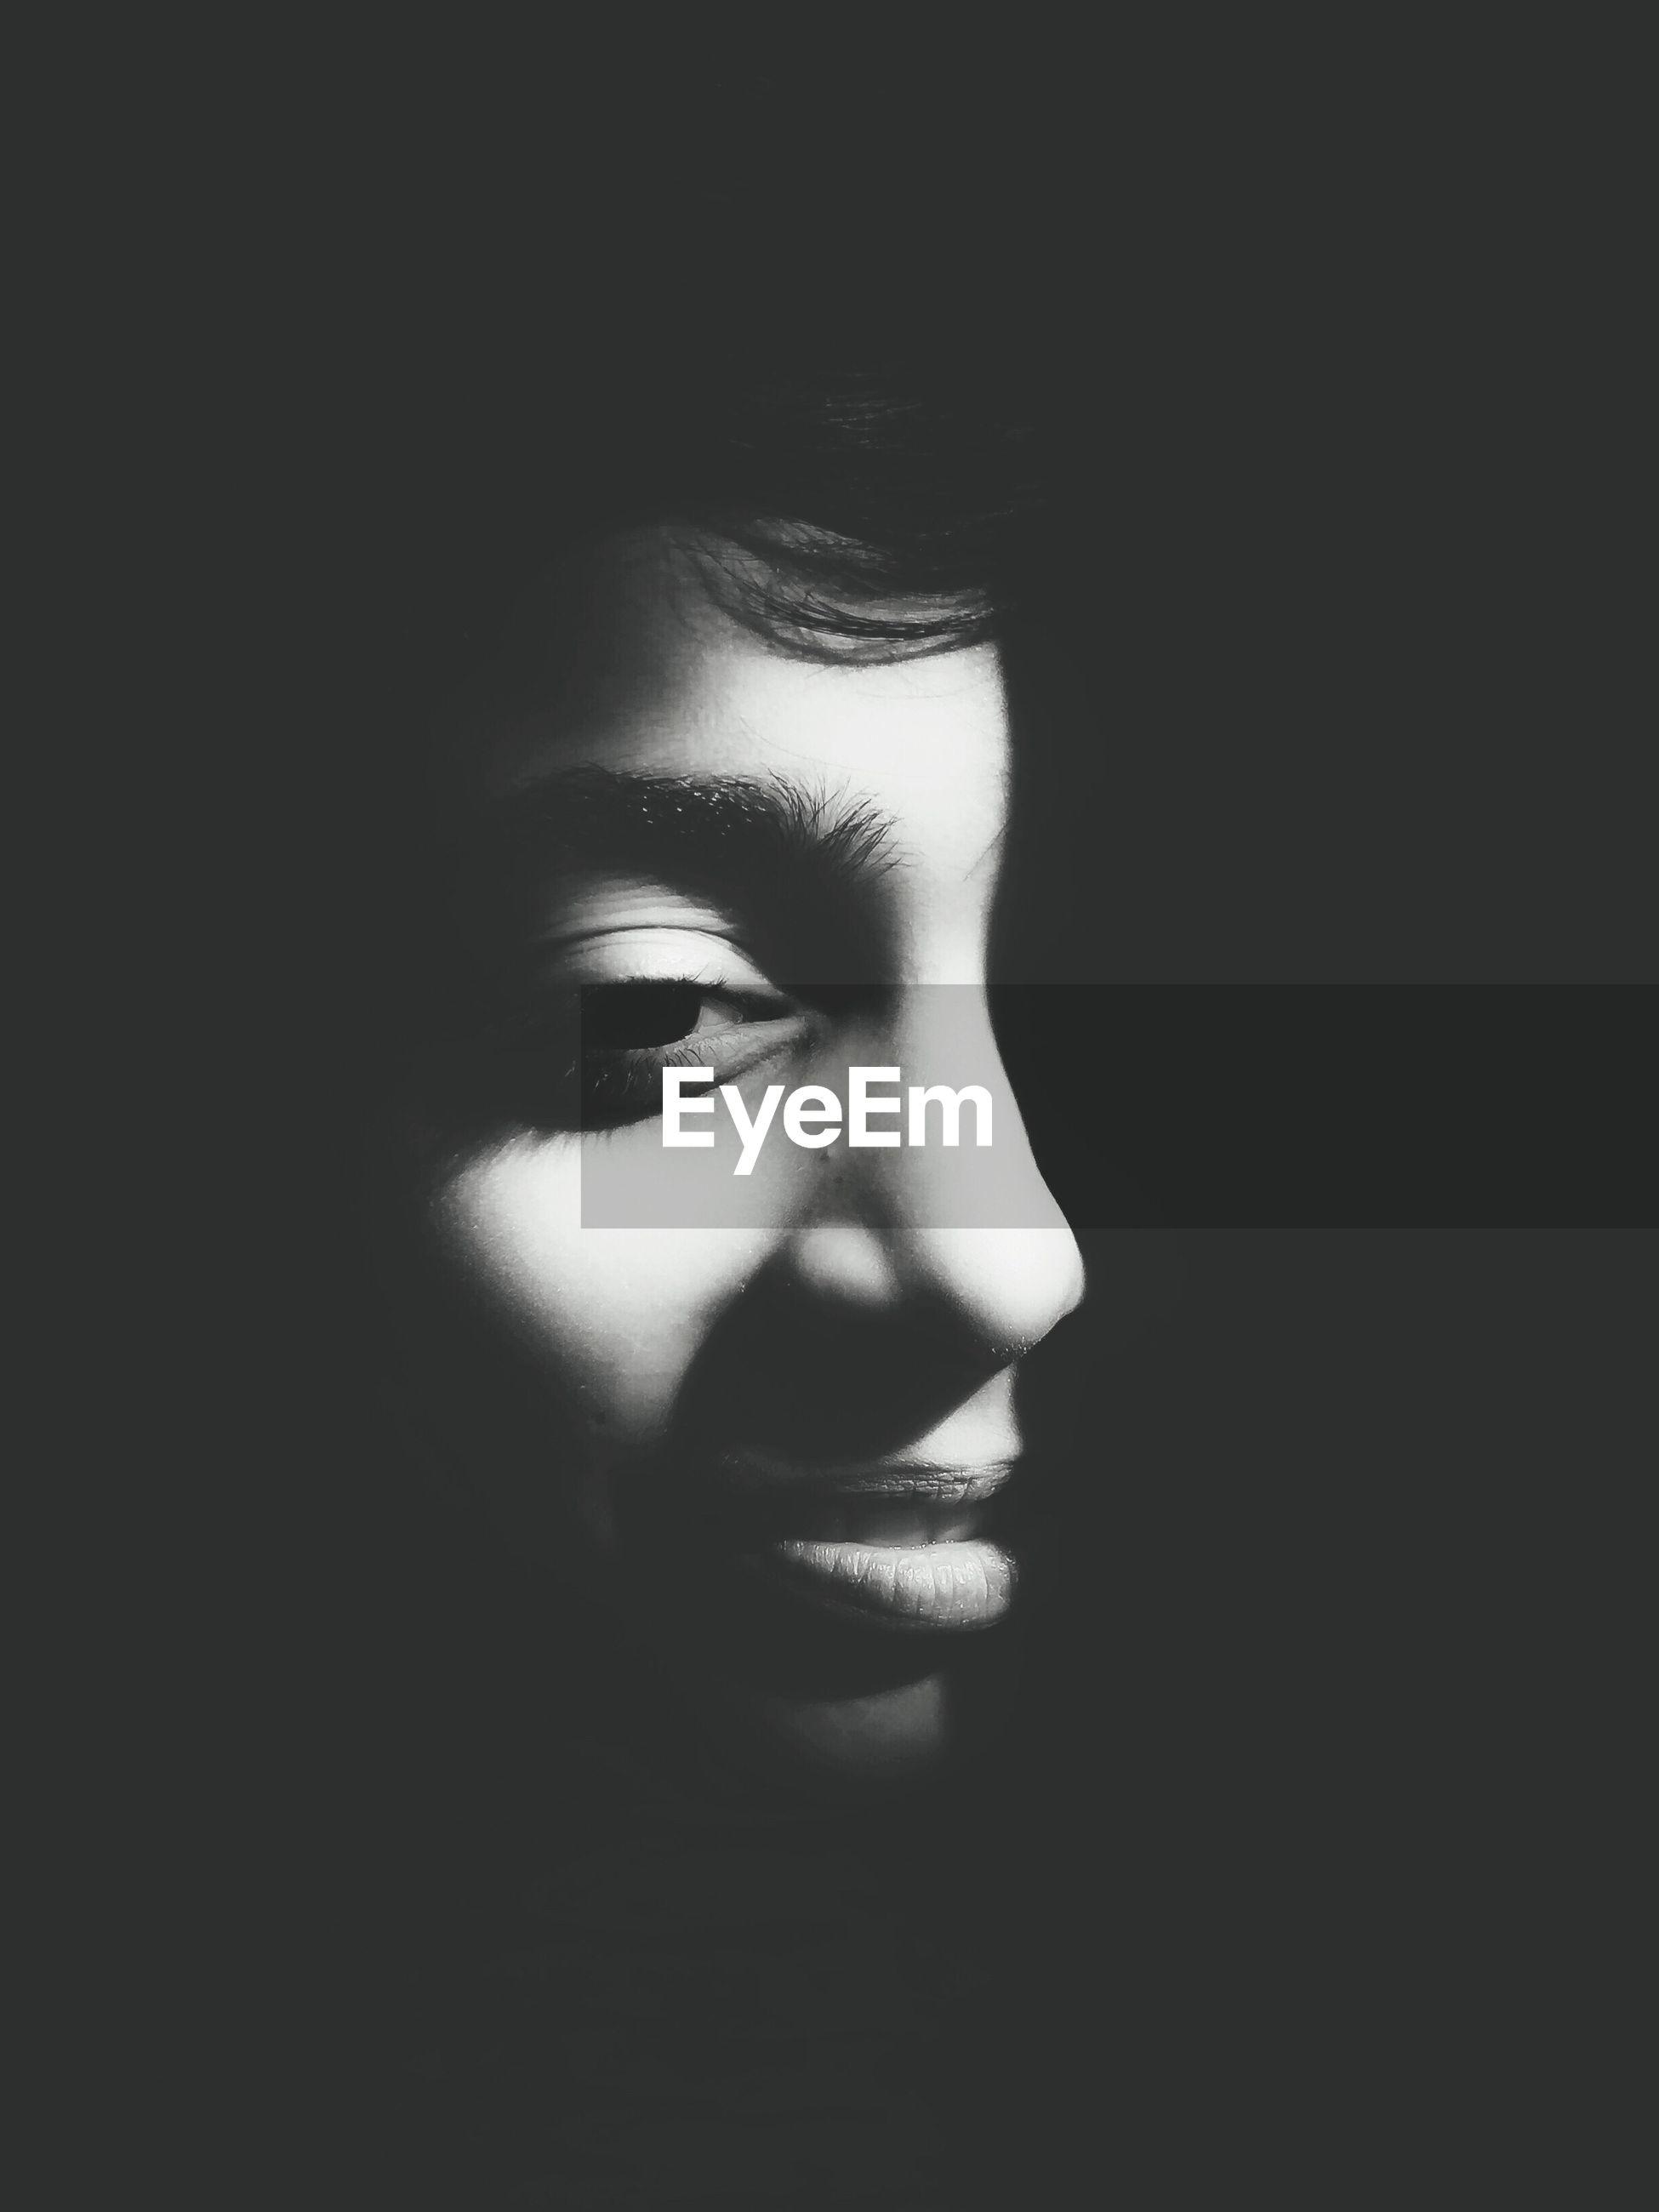 Close-up of boy against black background